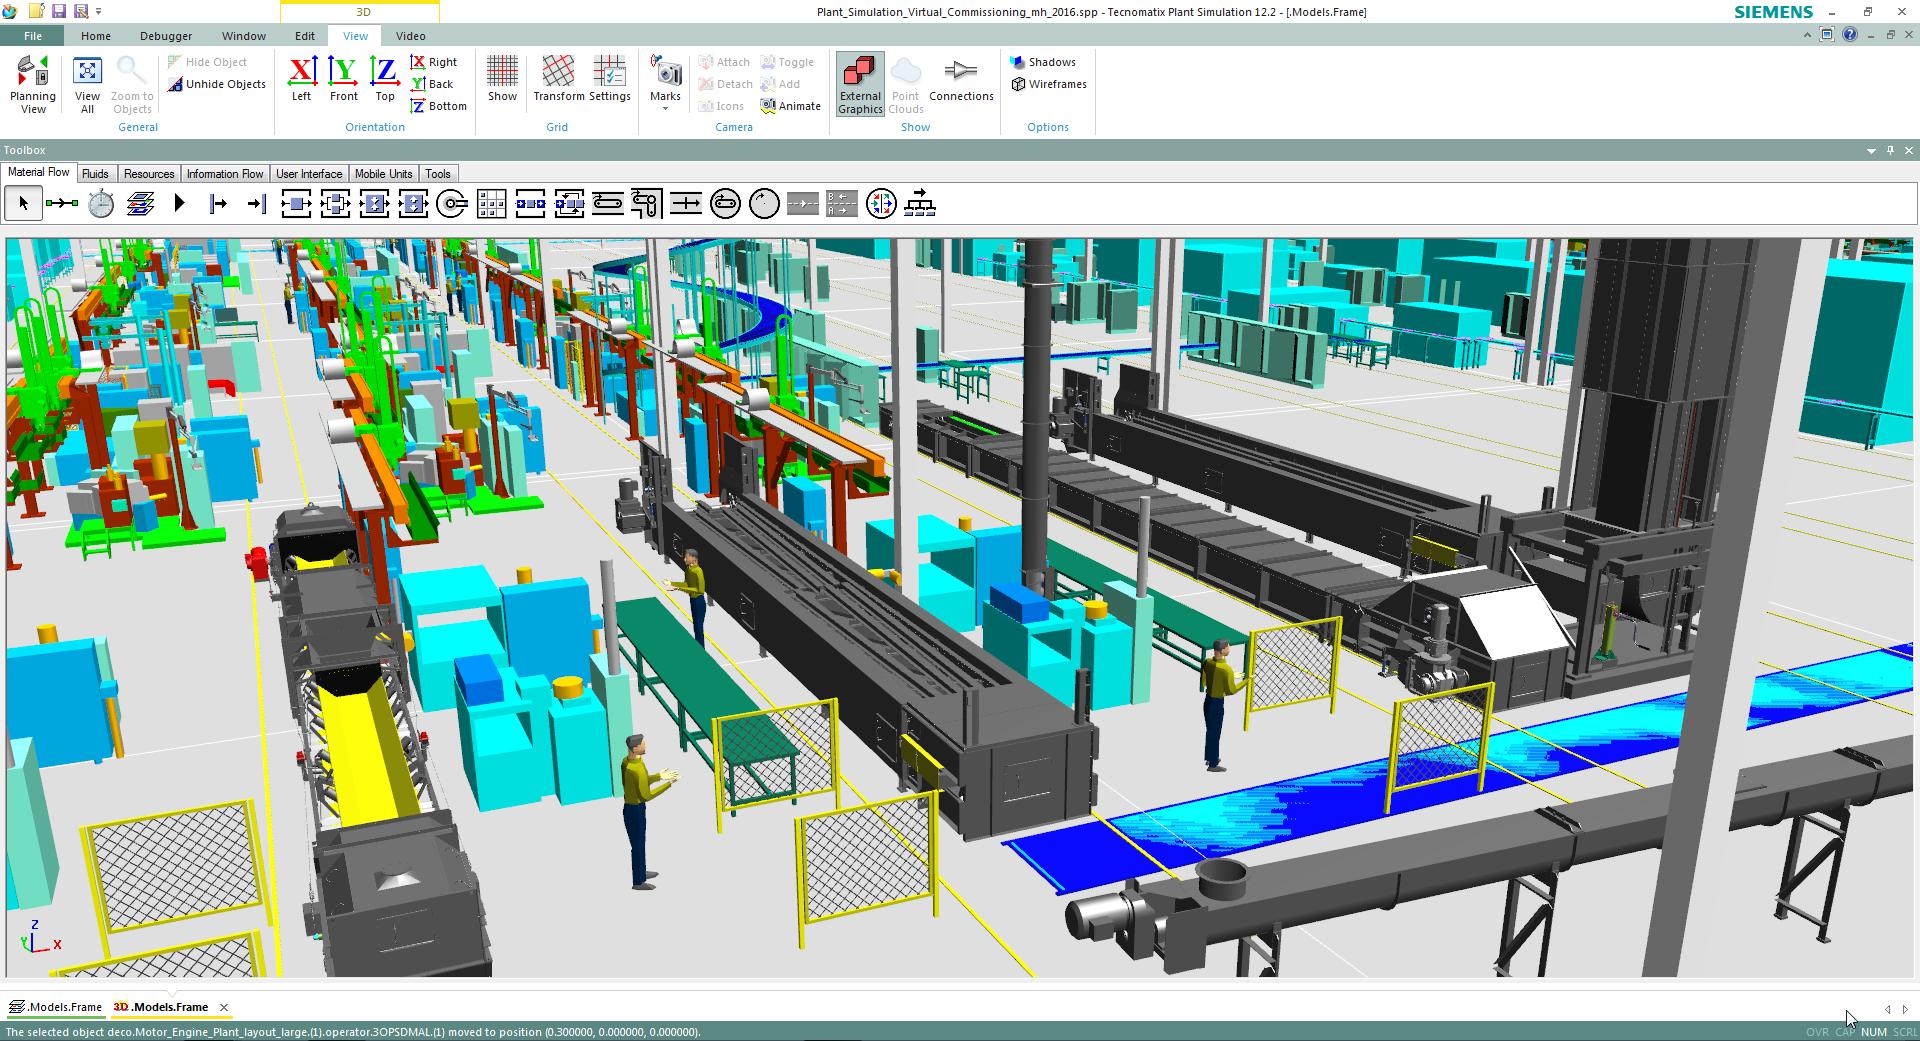 Virtual_Commissioning_Plant_Simulation_01.png